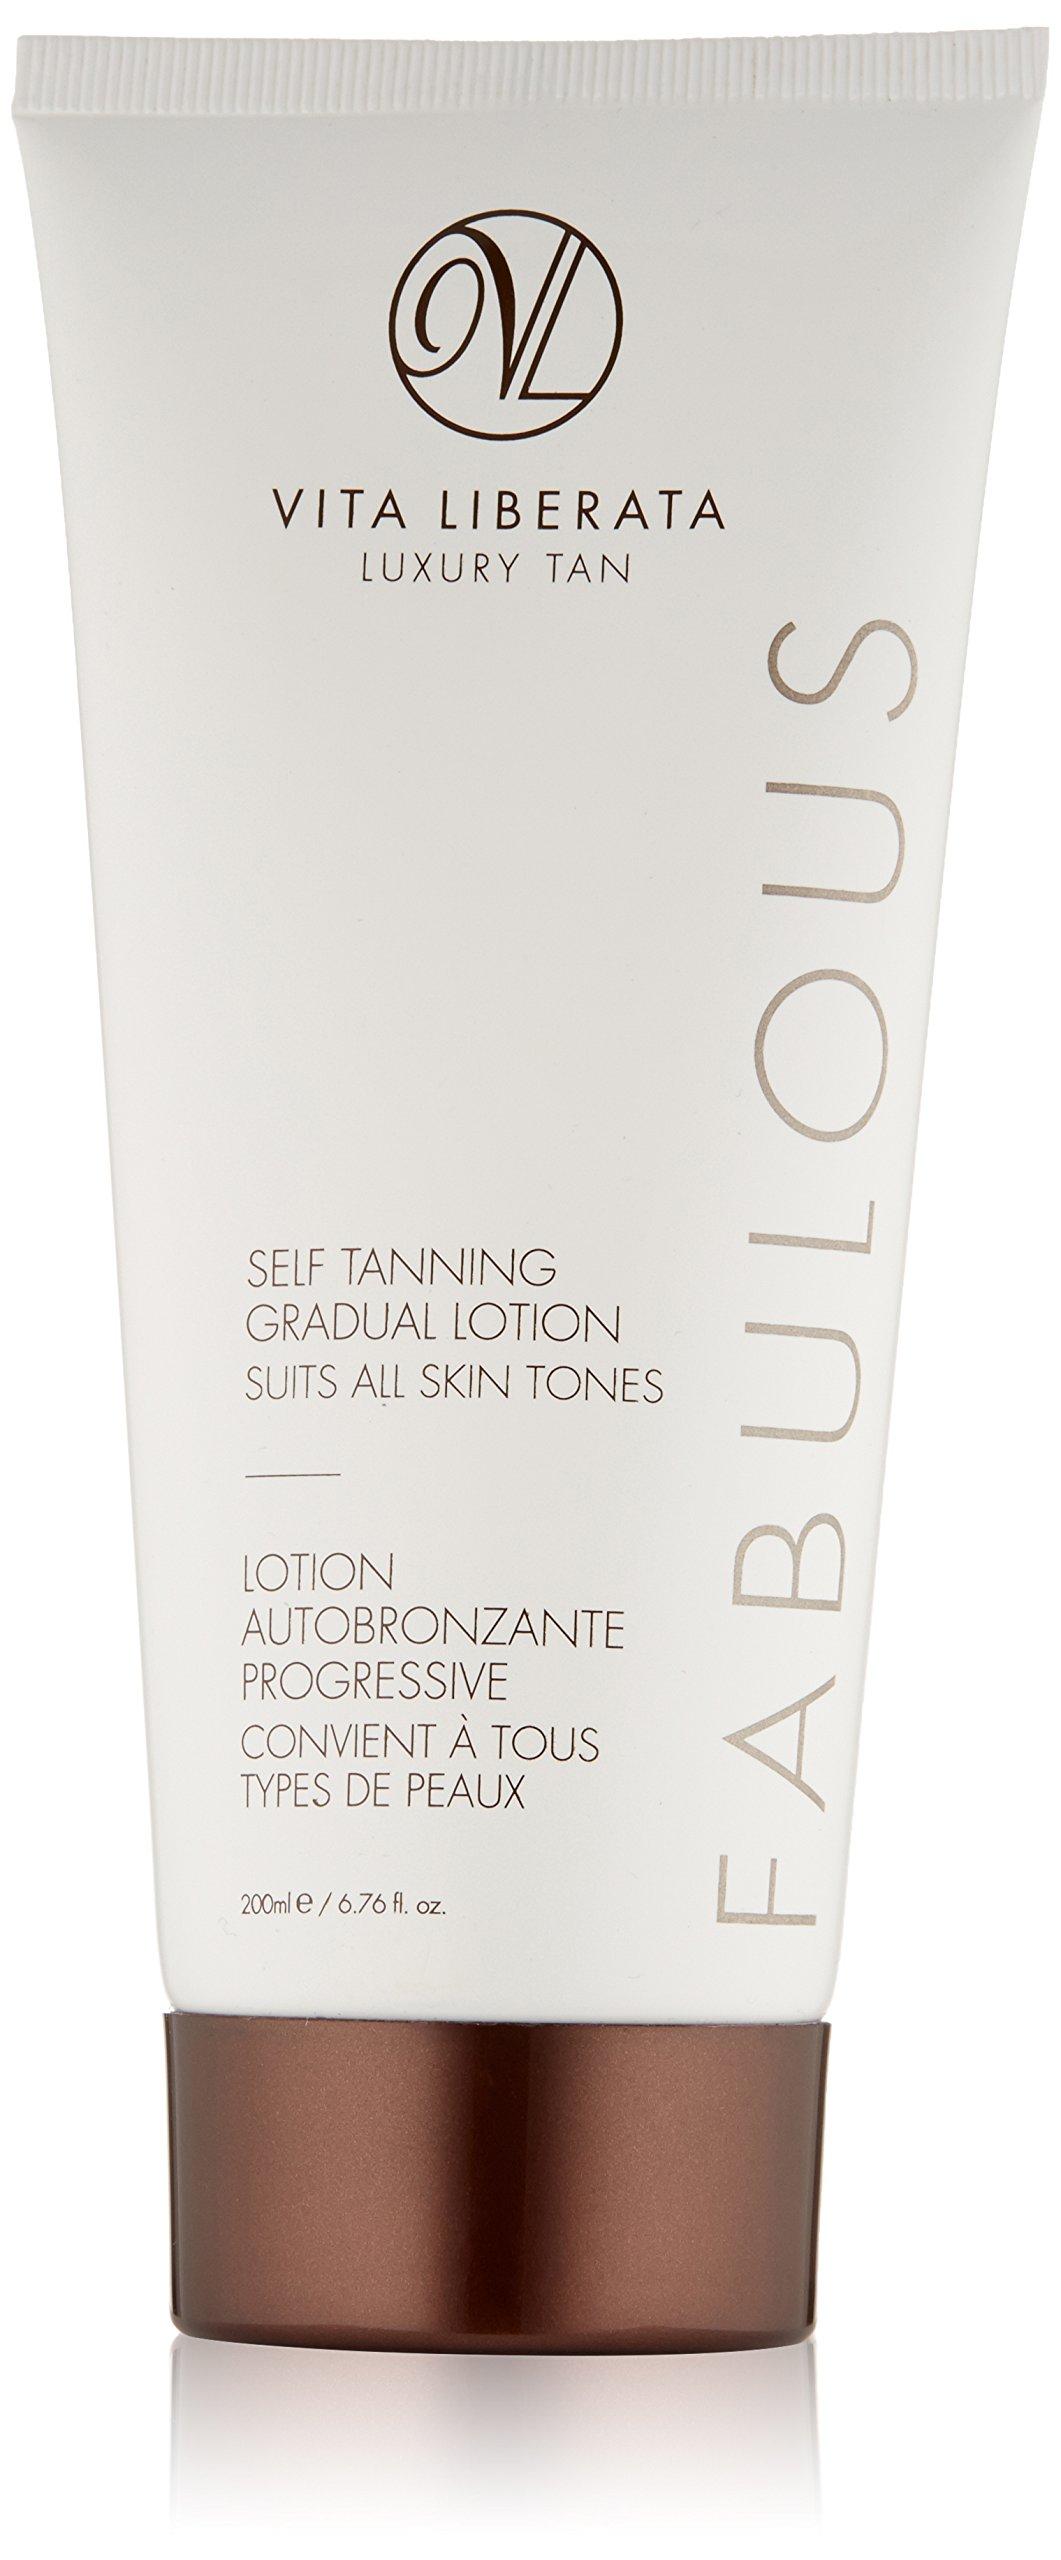 Organic Gradual Tan Lotion - VITA LIBERATA Fabulous Sunless Tanning Gradual Tanning Lotion, 6.76 Fl Oz by Vita Liberata